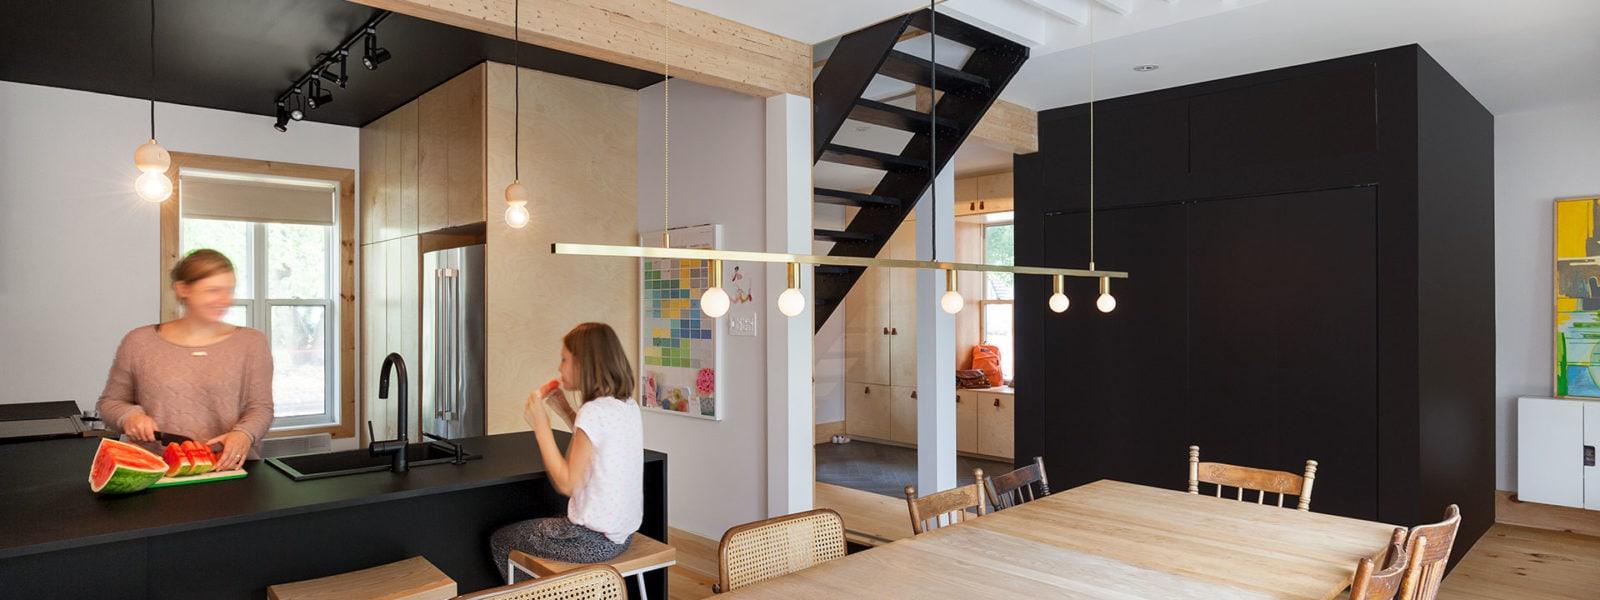 Lévesque Project / Mélissa Ohnona Design